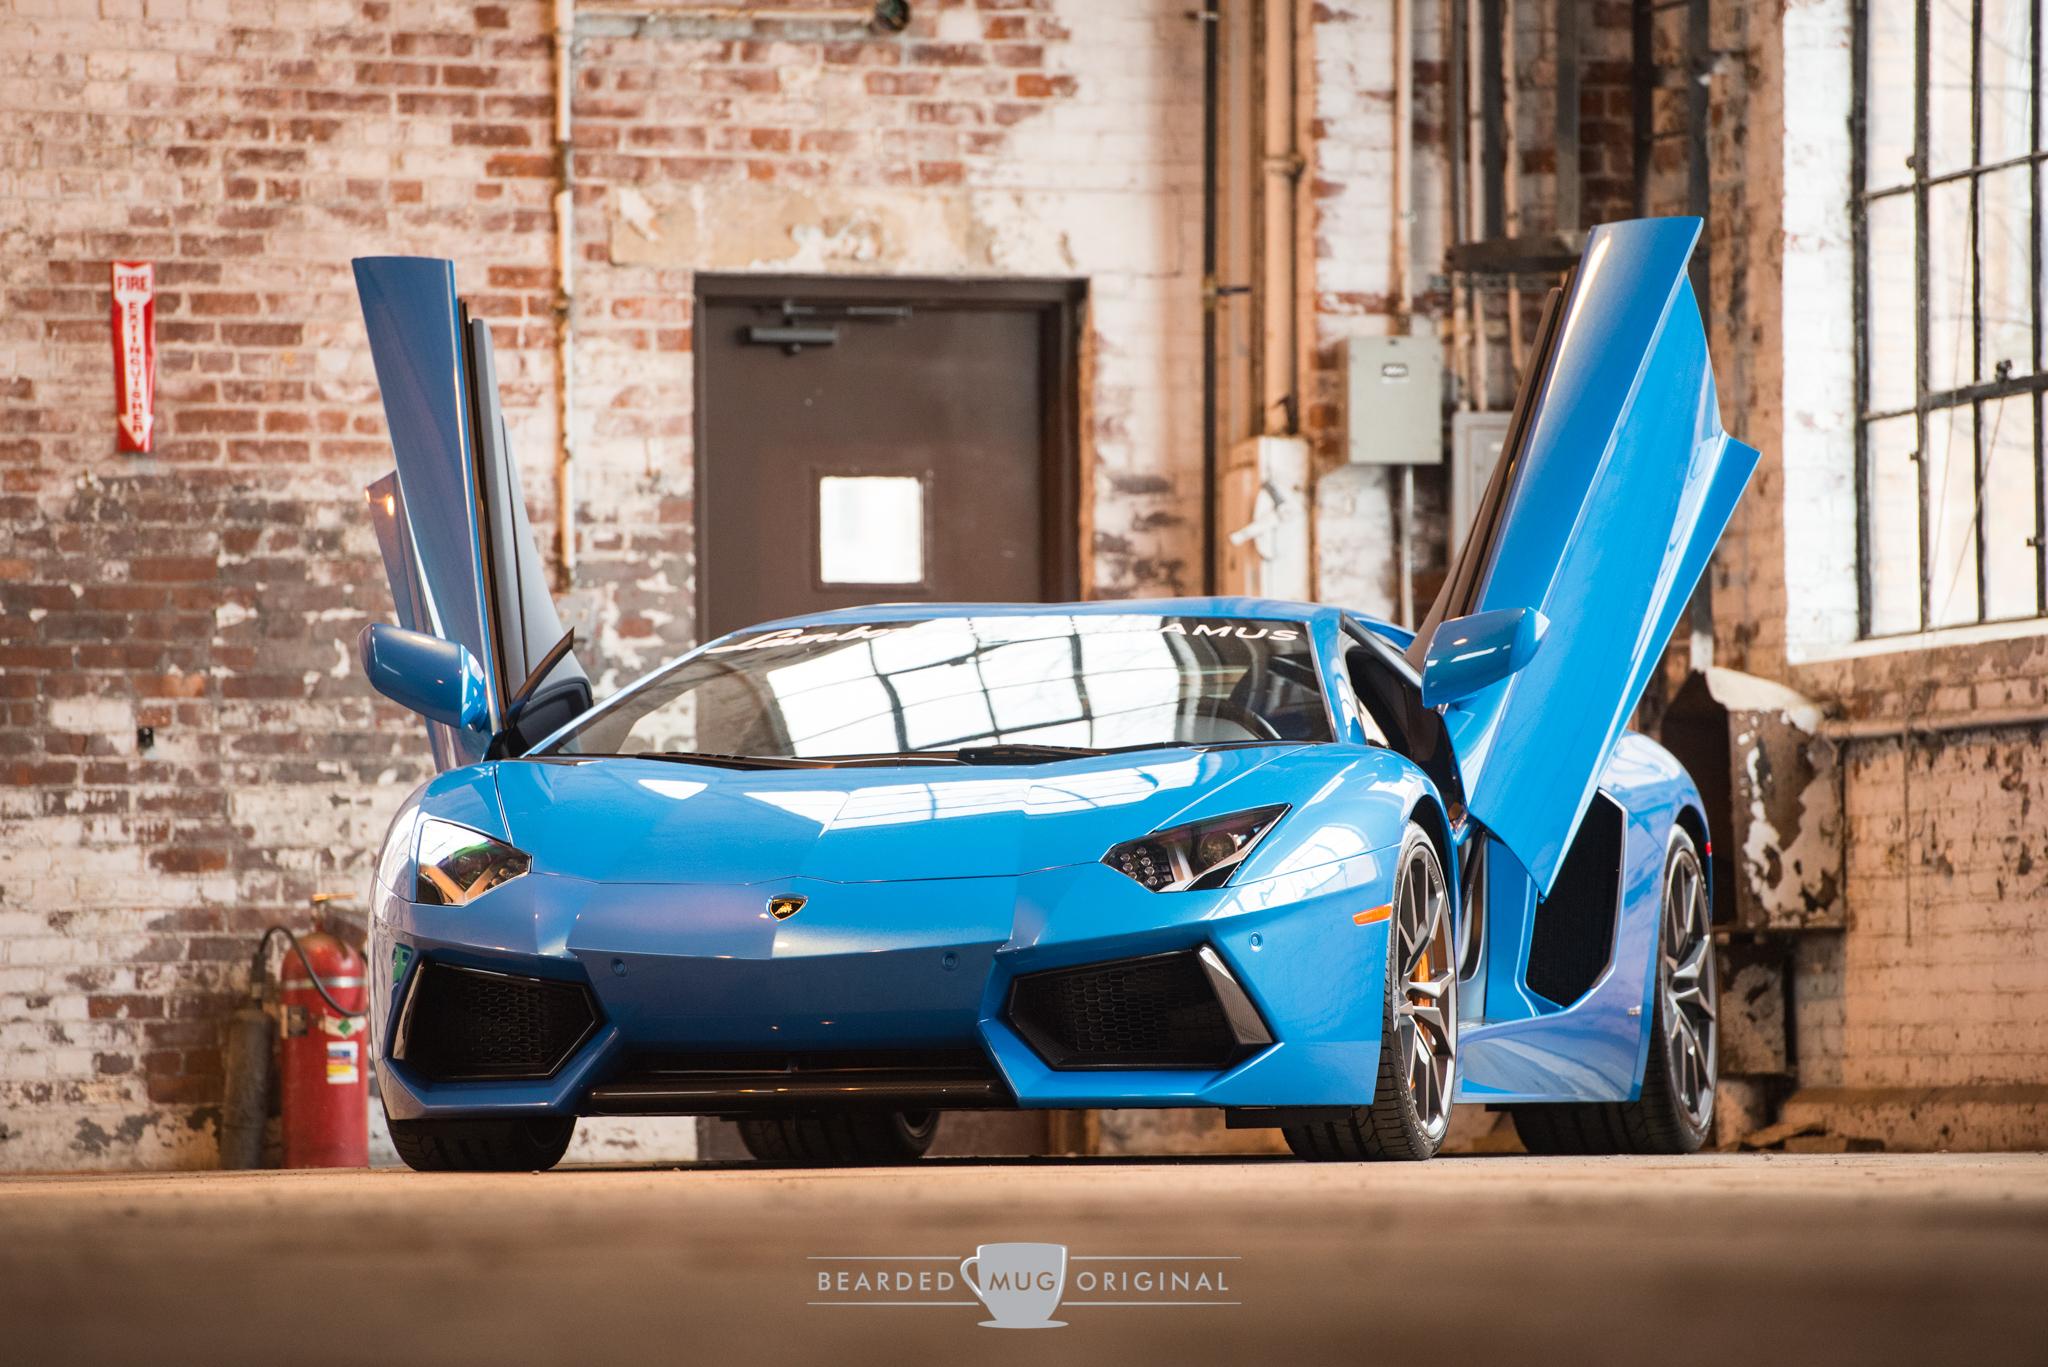 The Lamborghini Aventador knows how to pose for the camera.